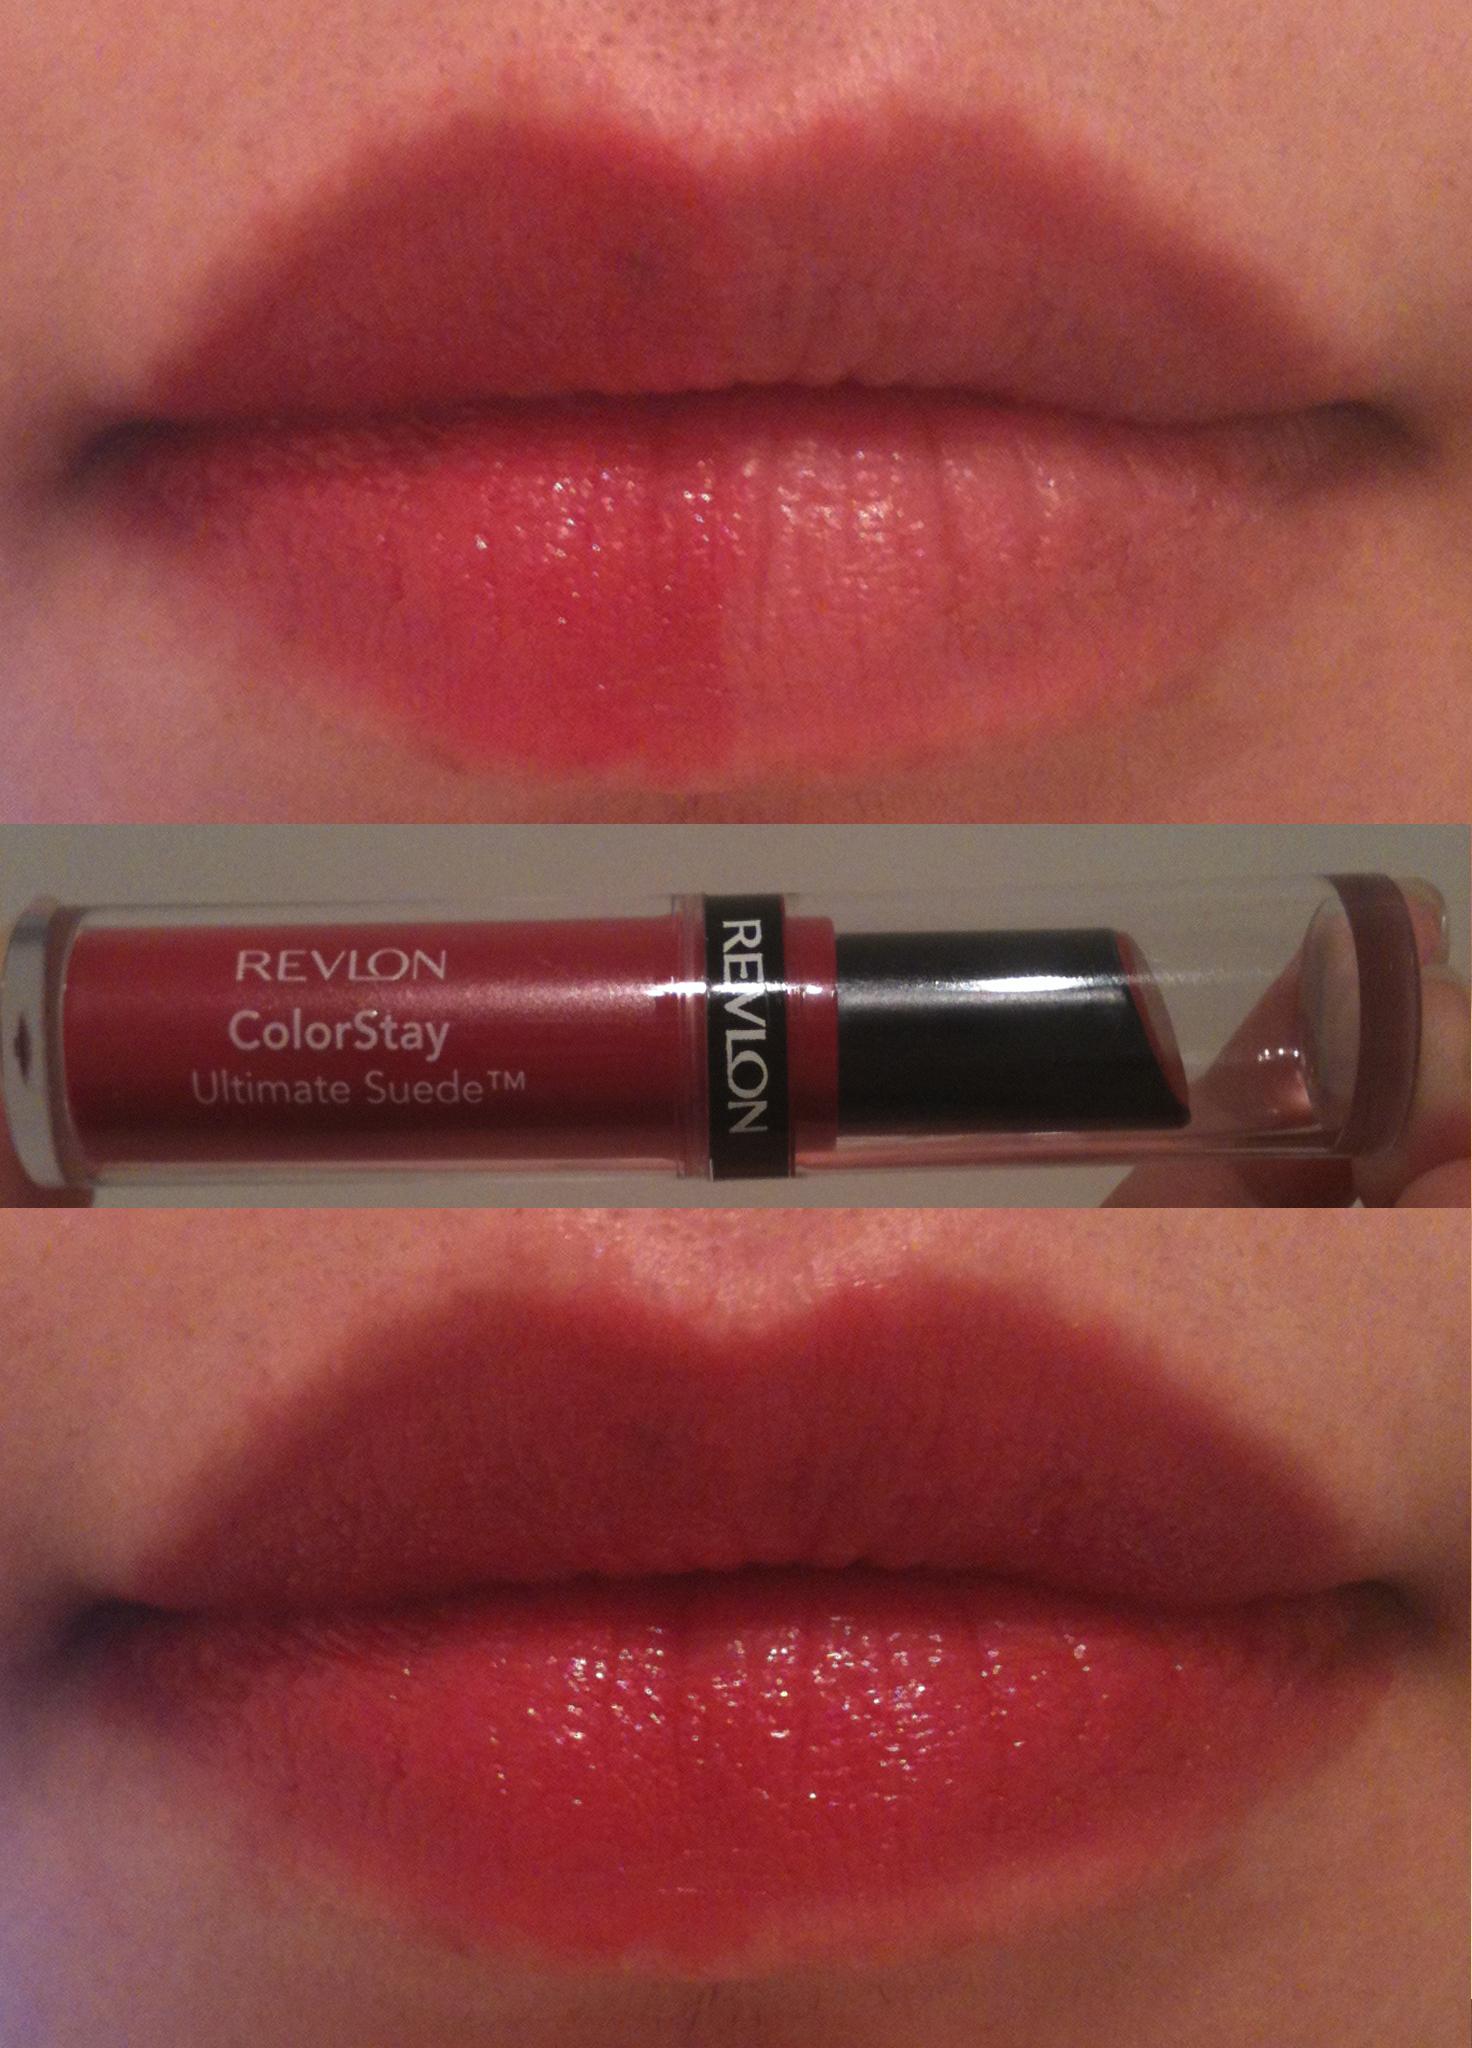 Revlon Colorstay Ultimate Suede Lipstick - Bellyrubz Beauty -